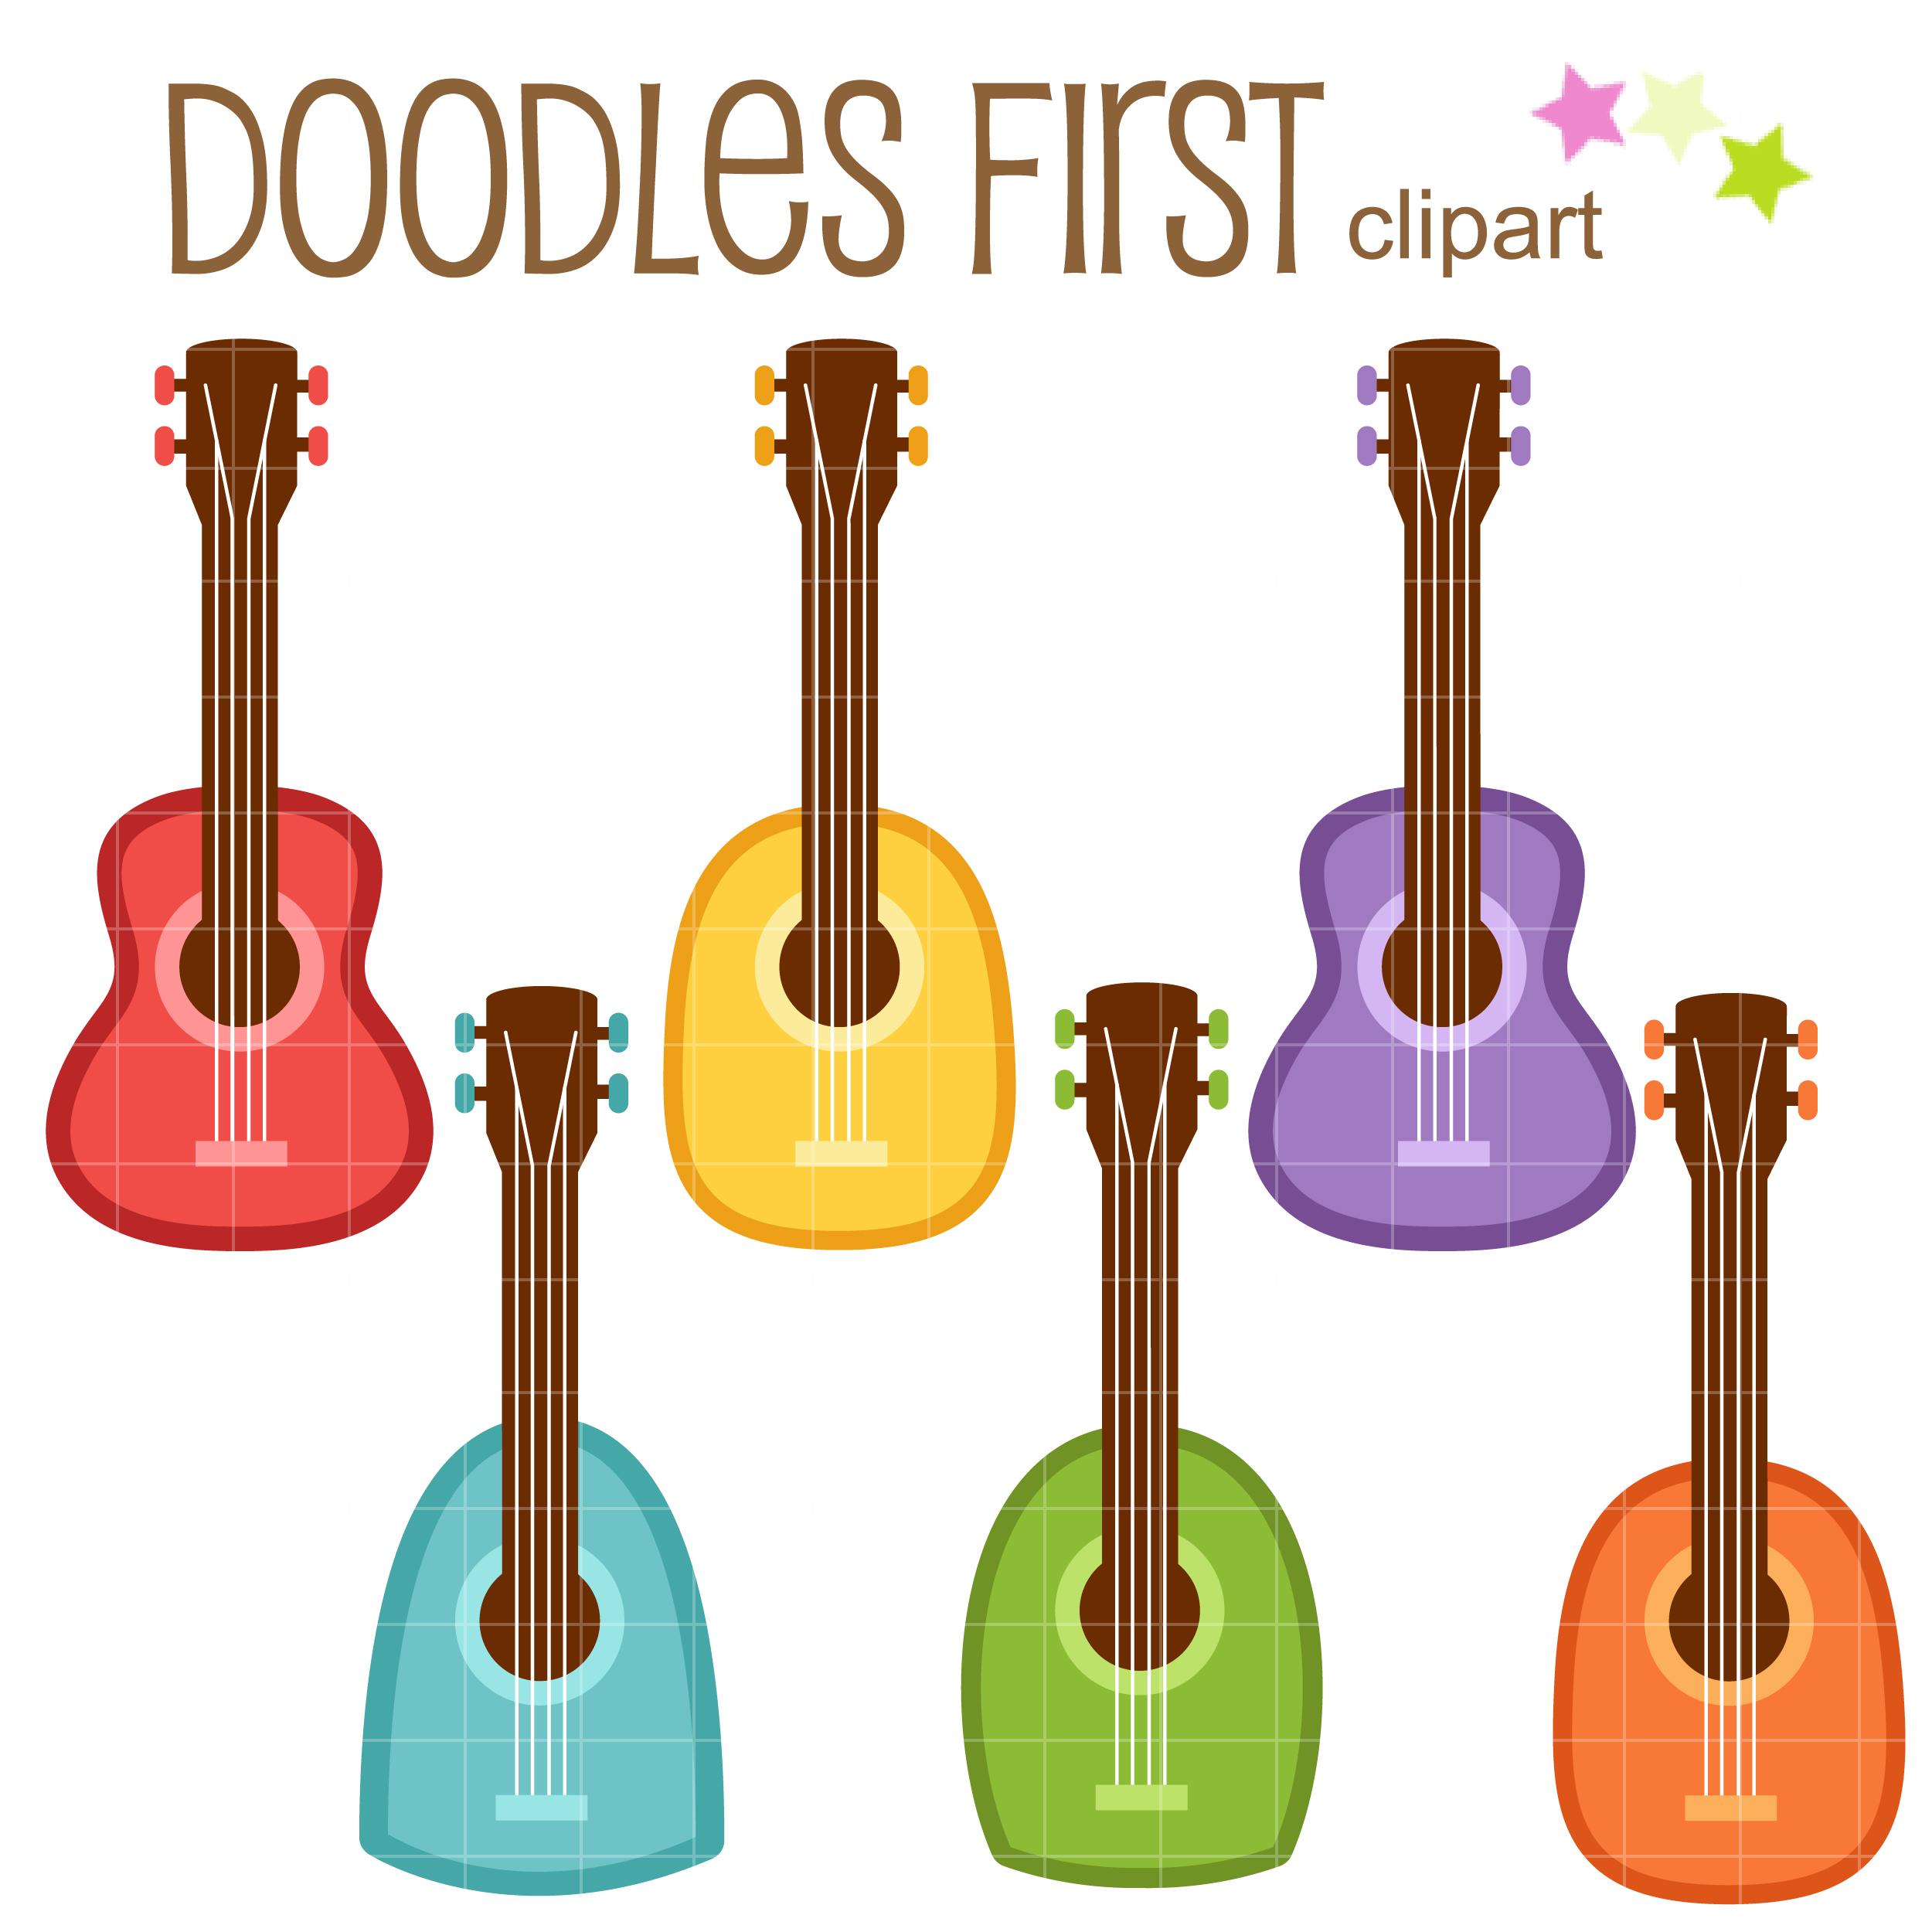 2500x2500 Free Cute Colorful Ukelele Clip Art Set Daily Art Hub Free